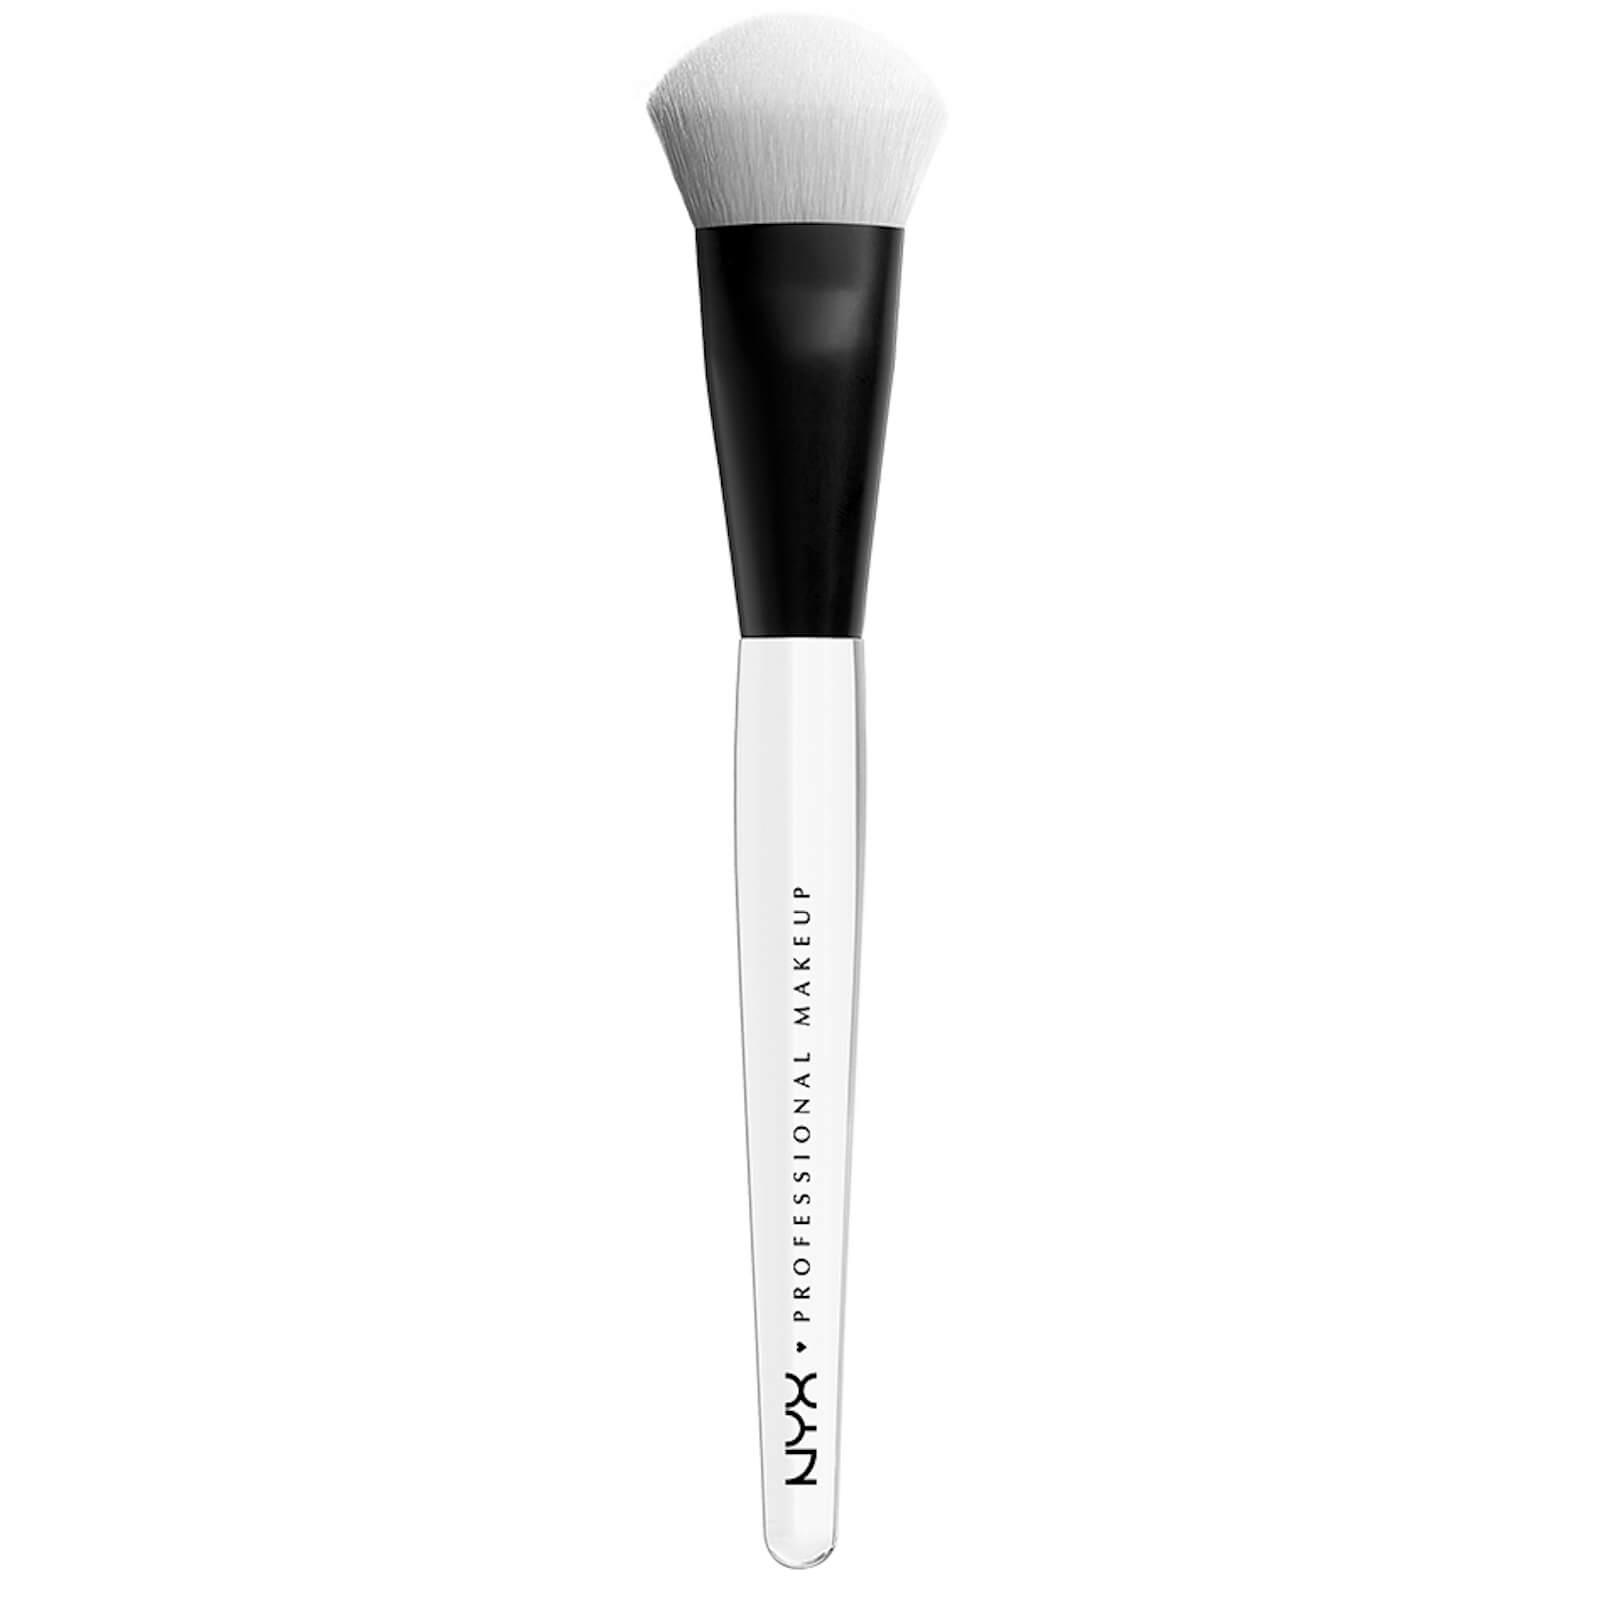 nyx professional makeup high glass illuminating powder face brush